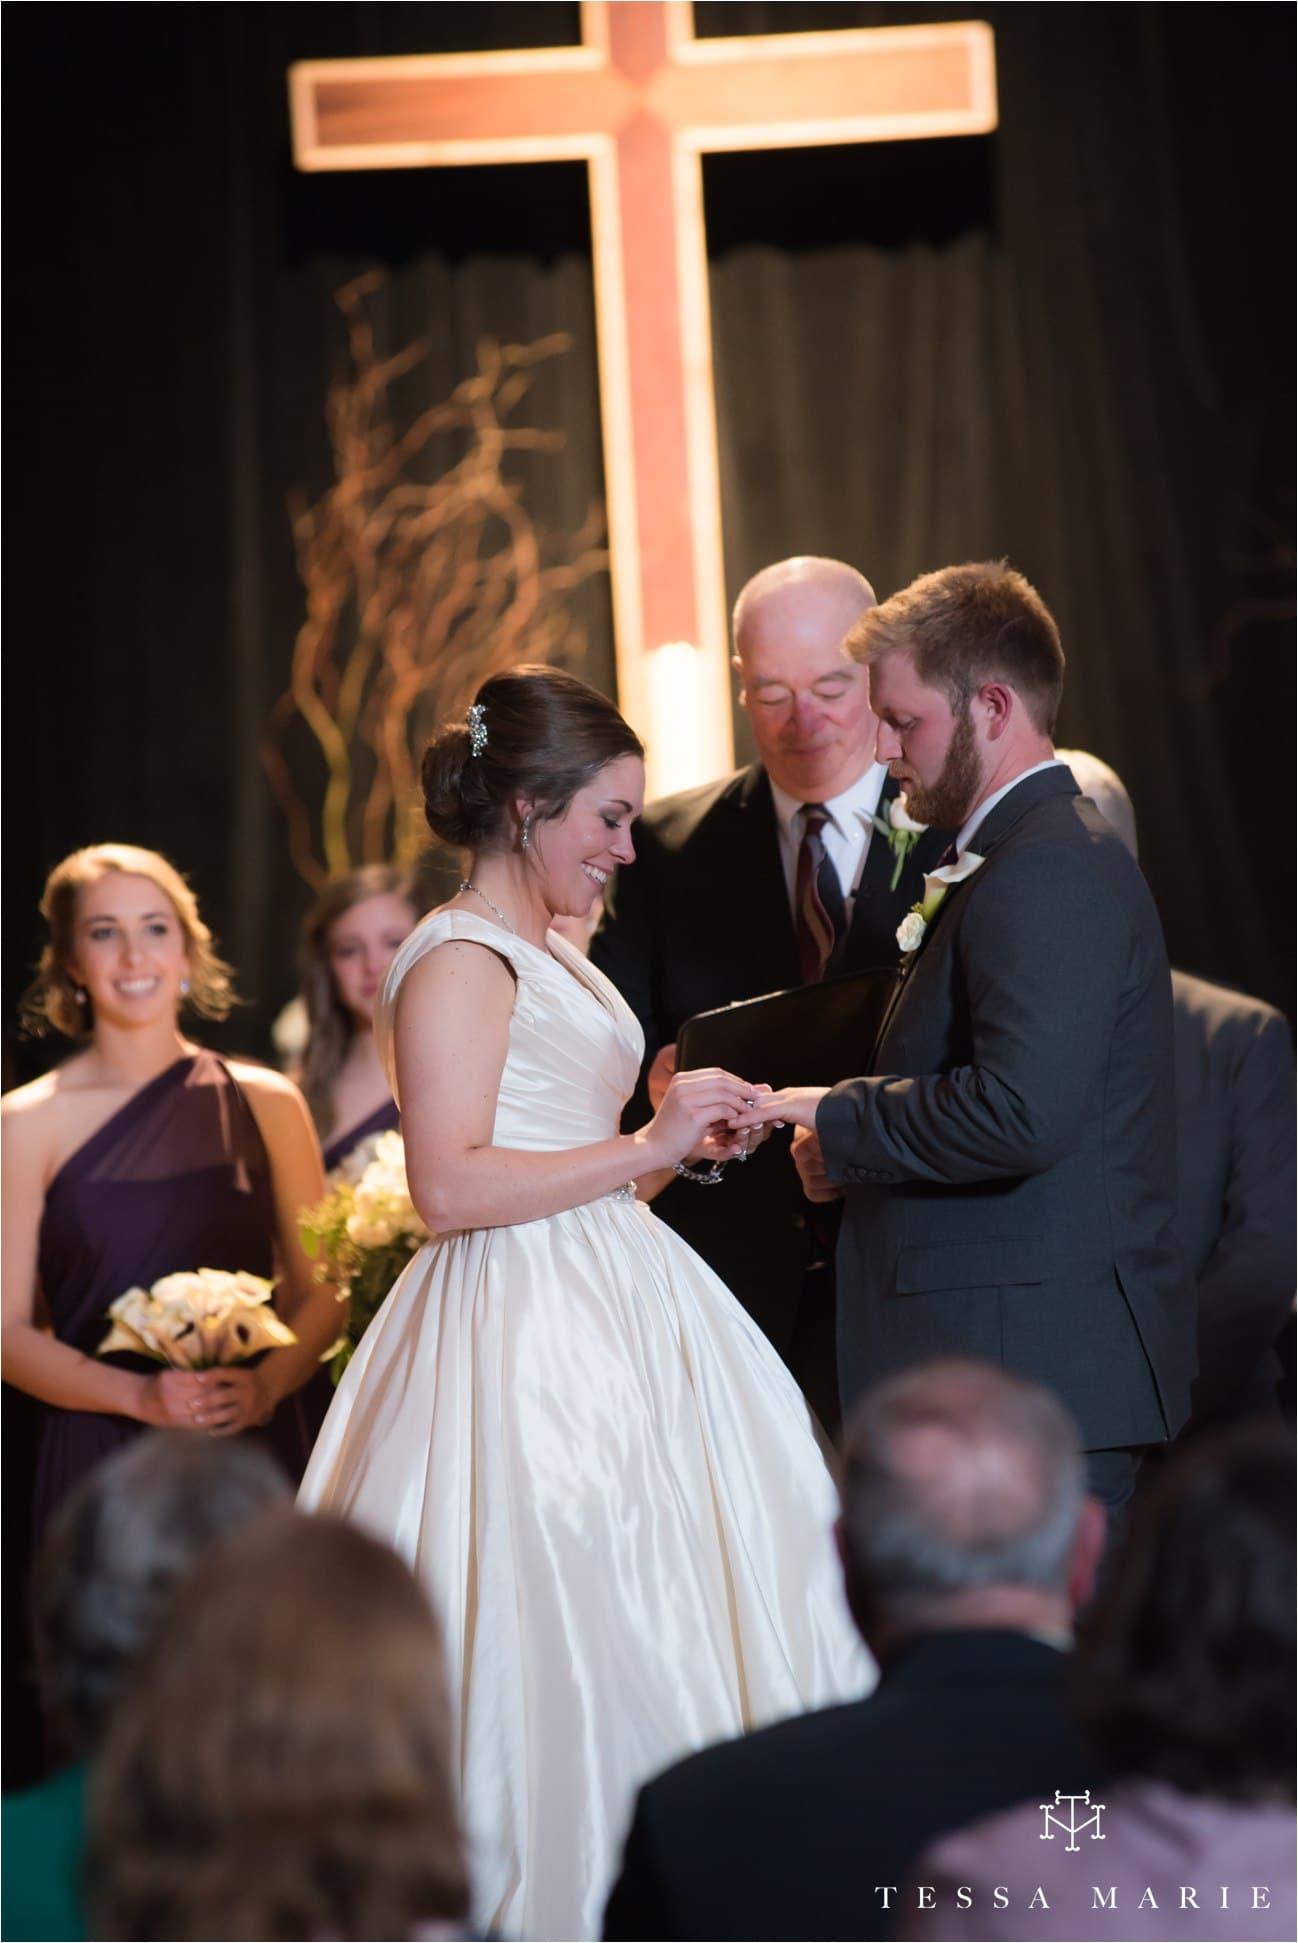 tessa_marie_weddings_wedding_moments_Tessa_marie_studios_0111